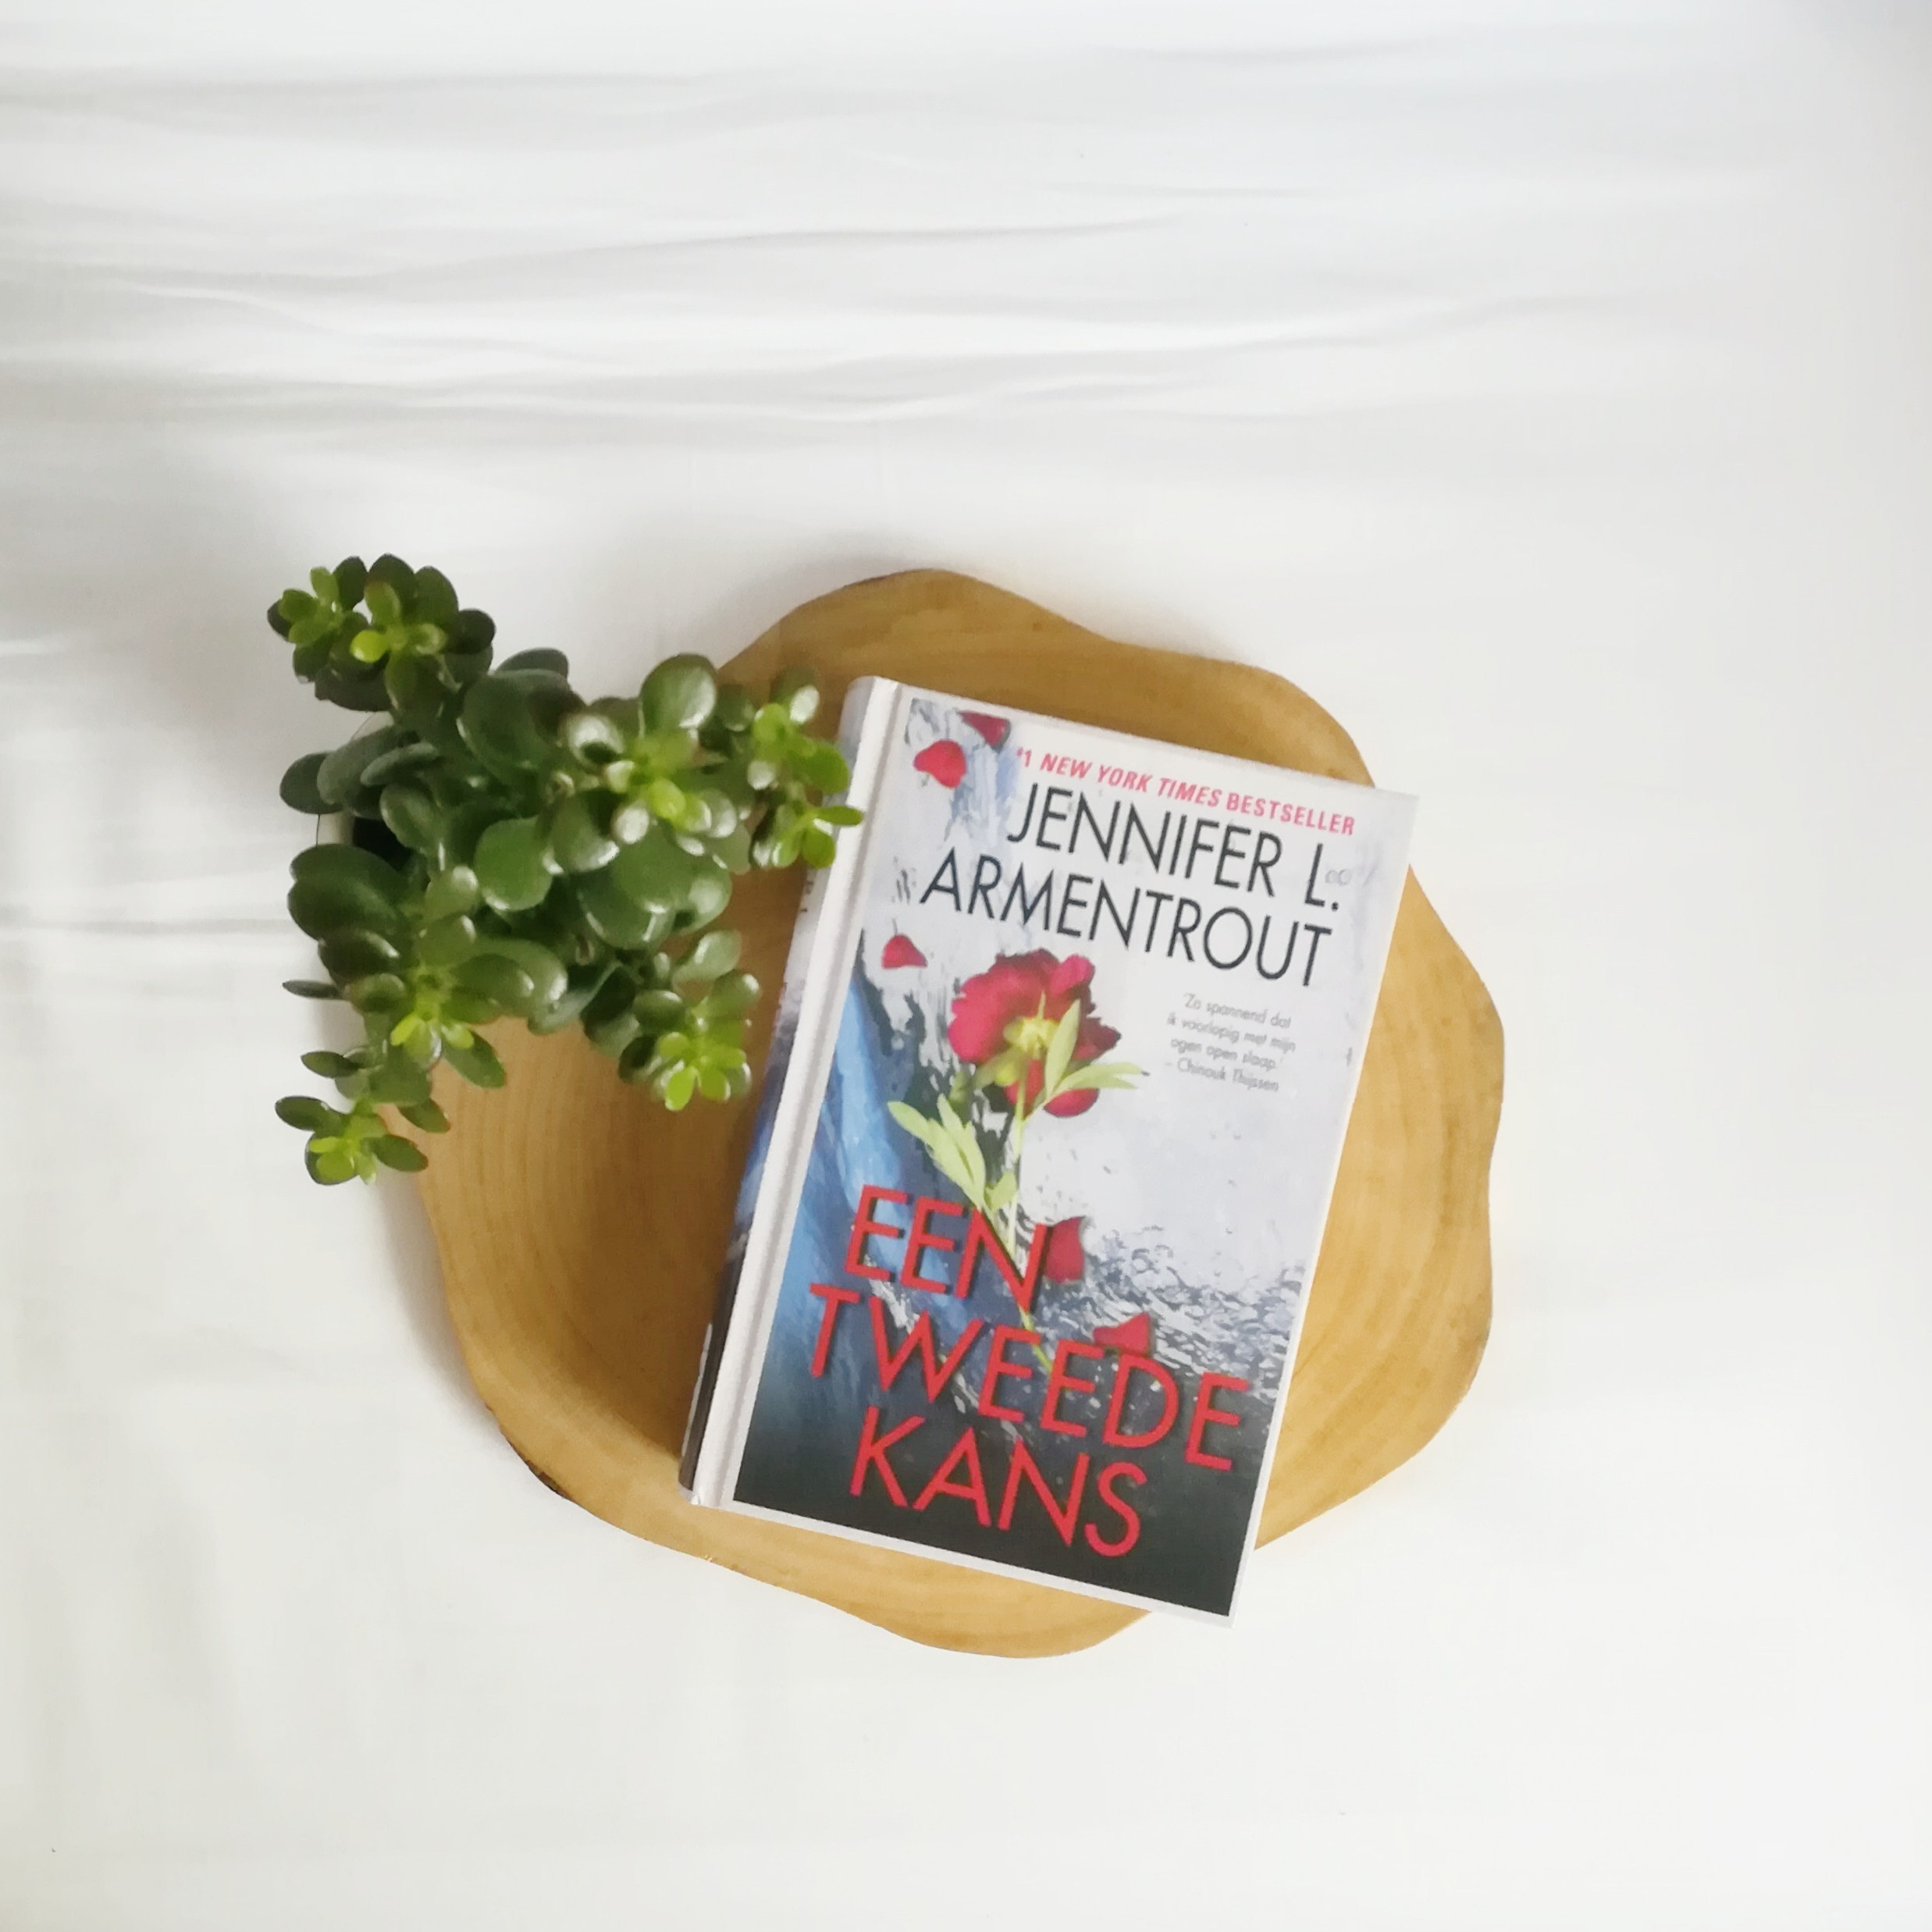 Een tweede kans Jennifer L. Armentrout | Marieke's Books recensie